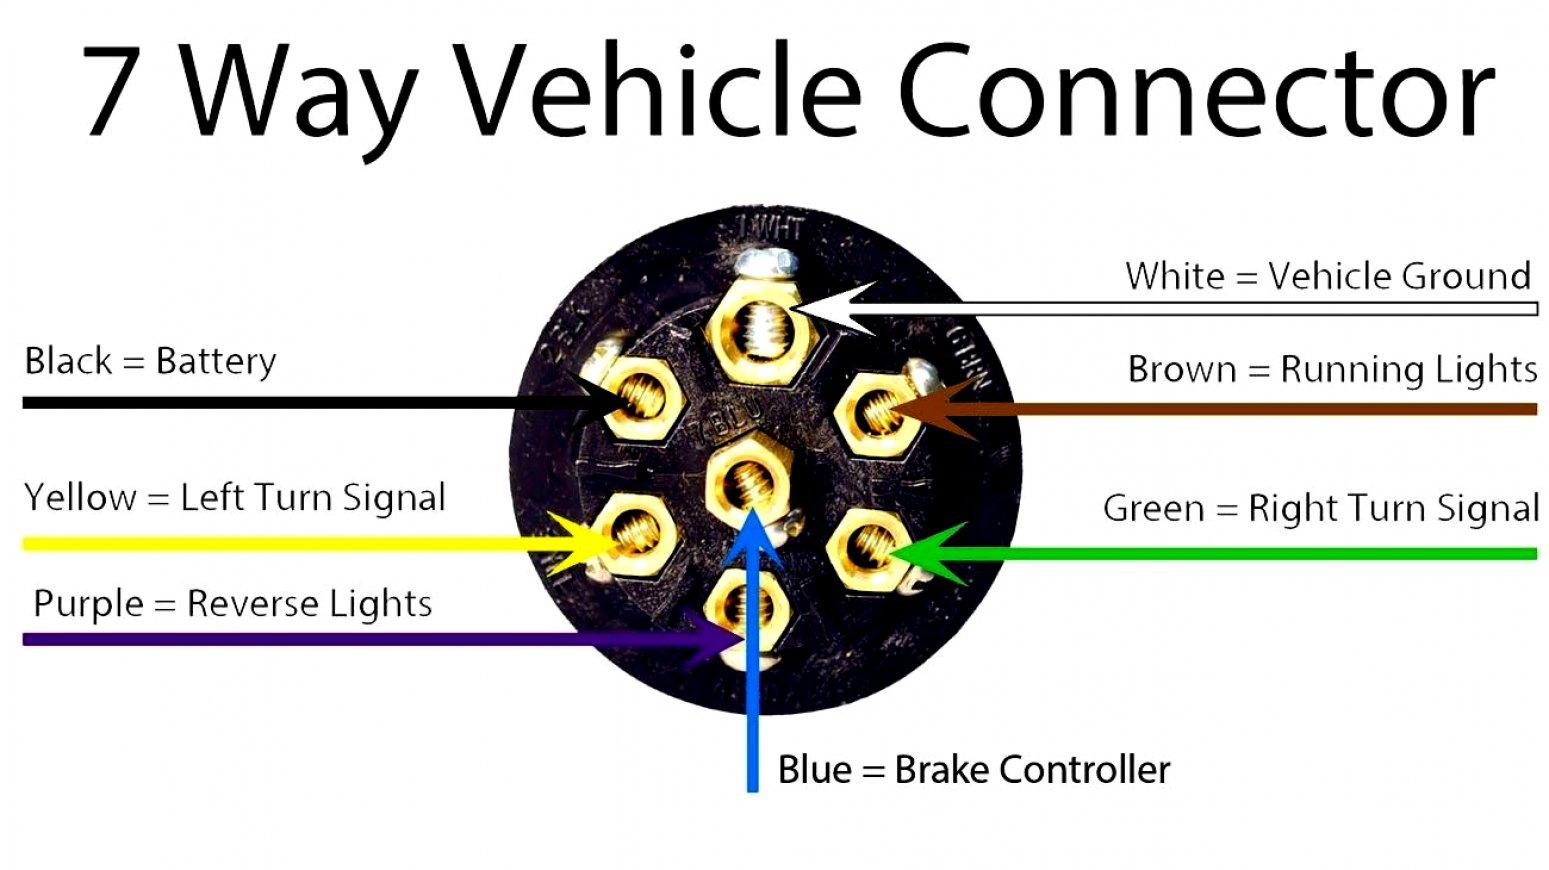 Semi Trailer Wiring Diagram - Wiring Diagram Schema Img - Semi Truck Trailer Plug Wiring Diagram